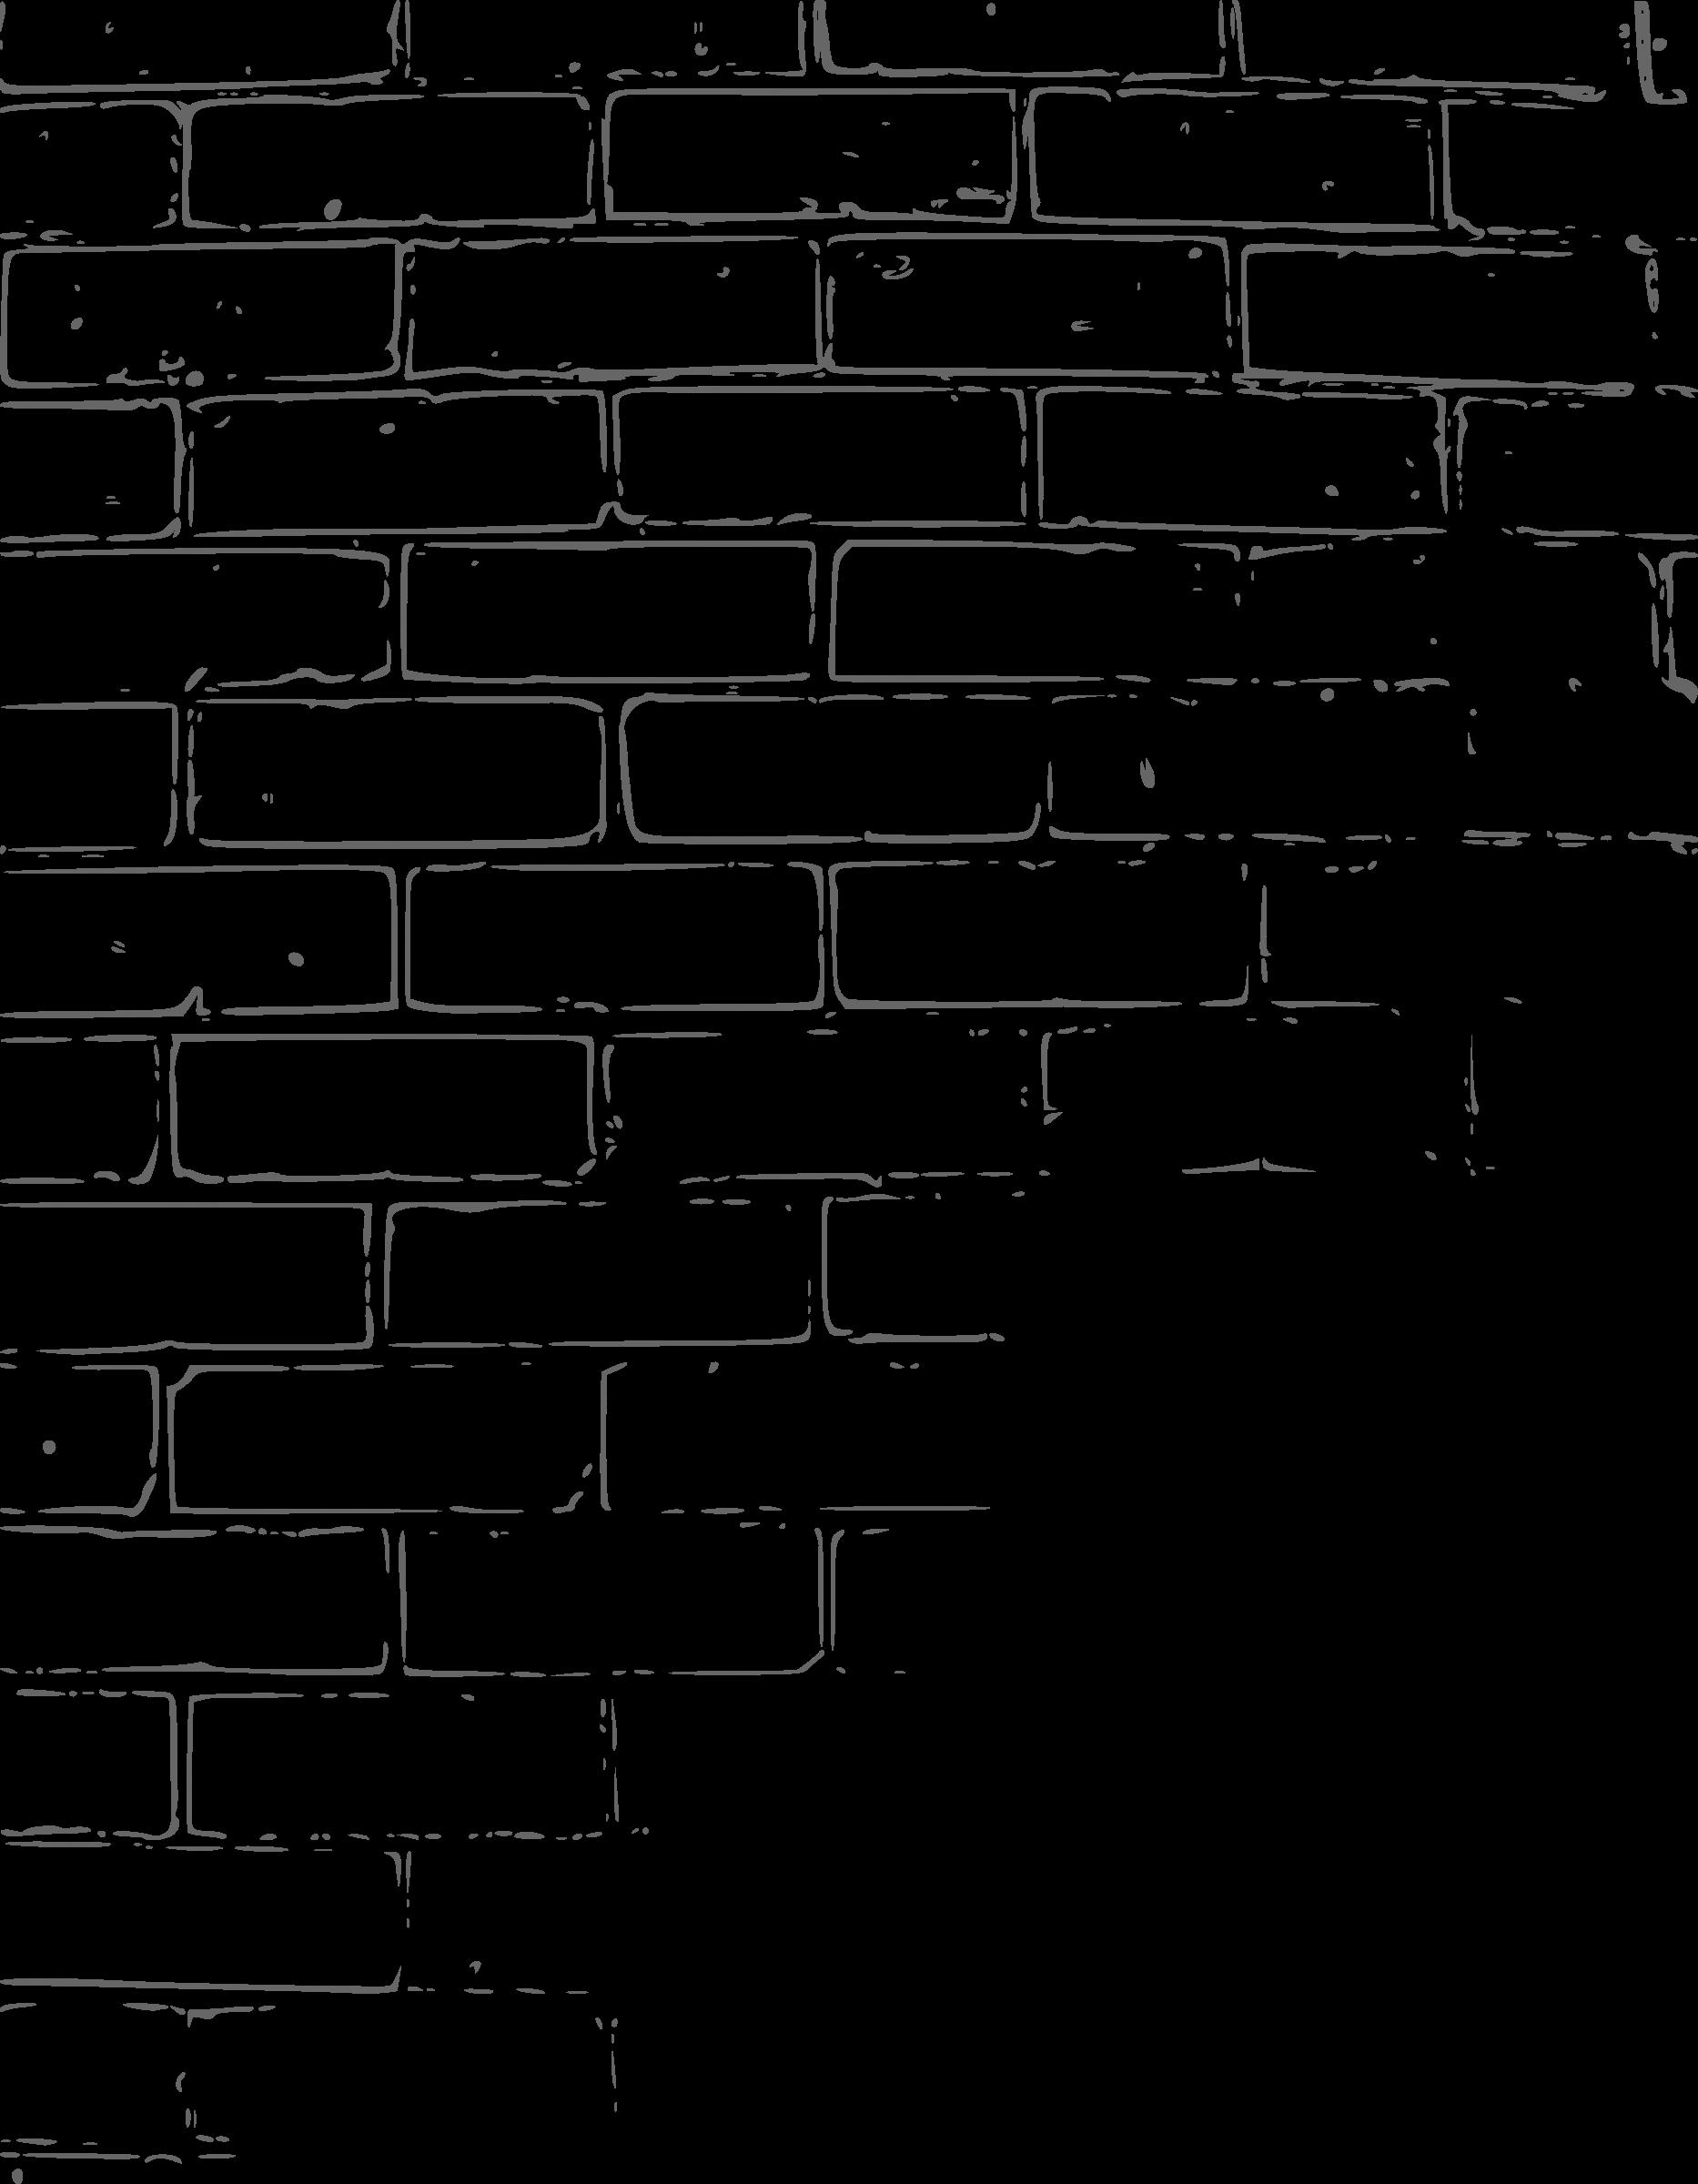 Texture big image png. Graffiti clipart brick wall